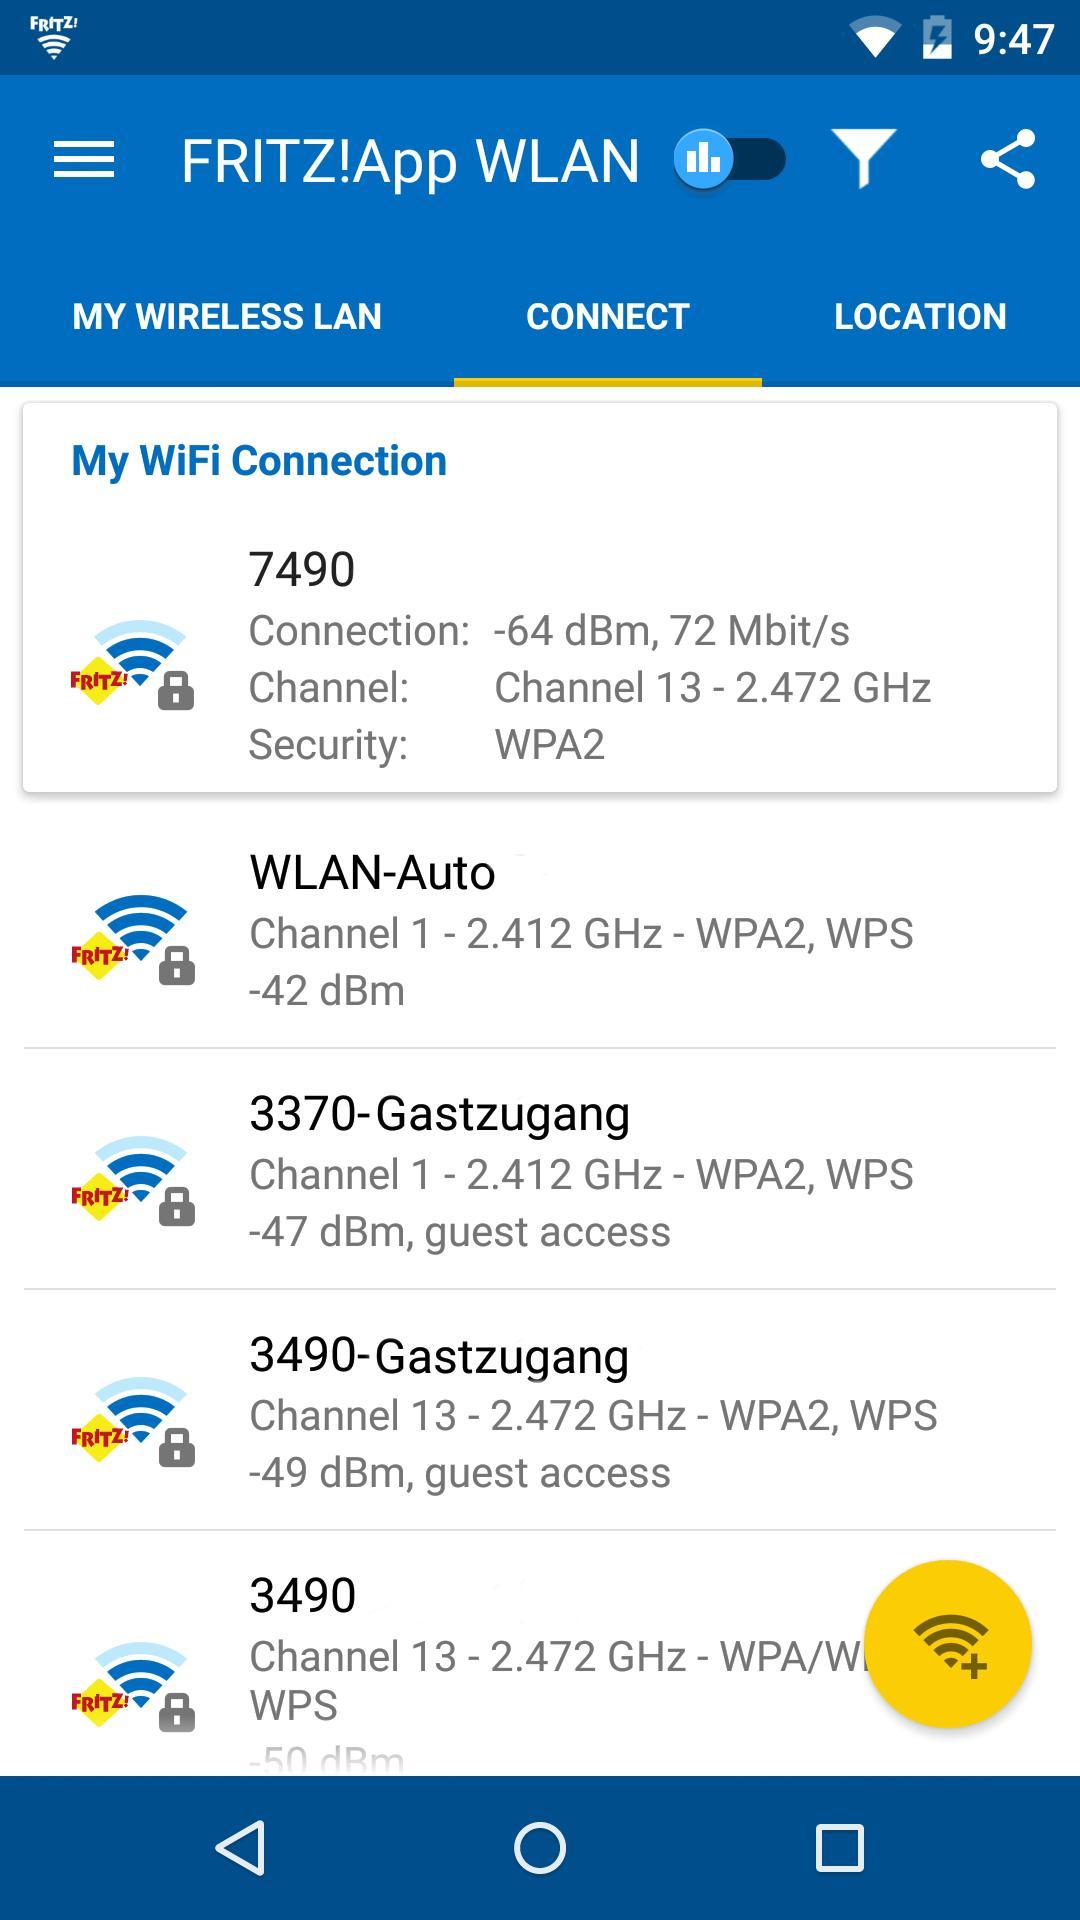 FRITZ!App WLAN 2.8.14 Screenshot 2